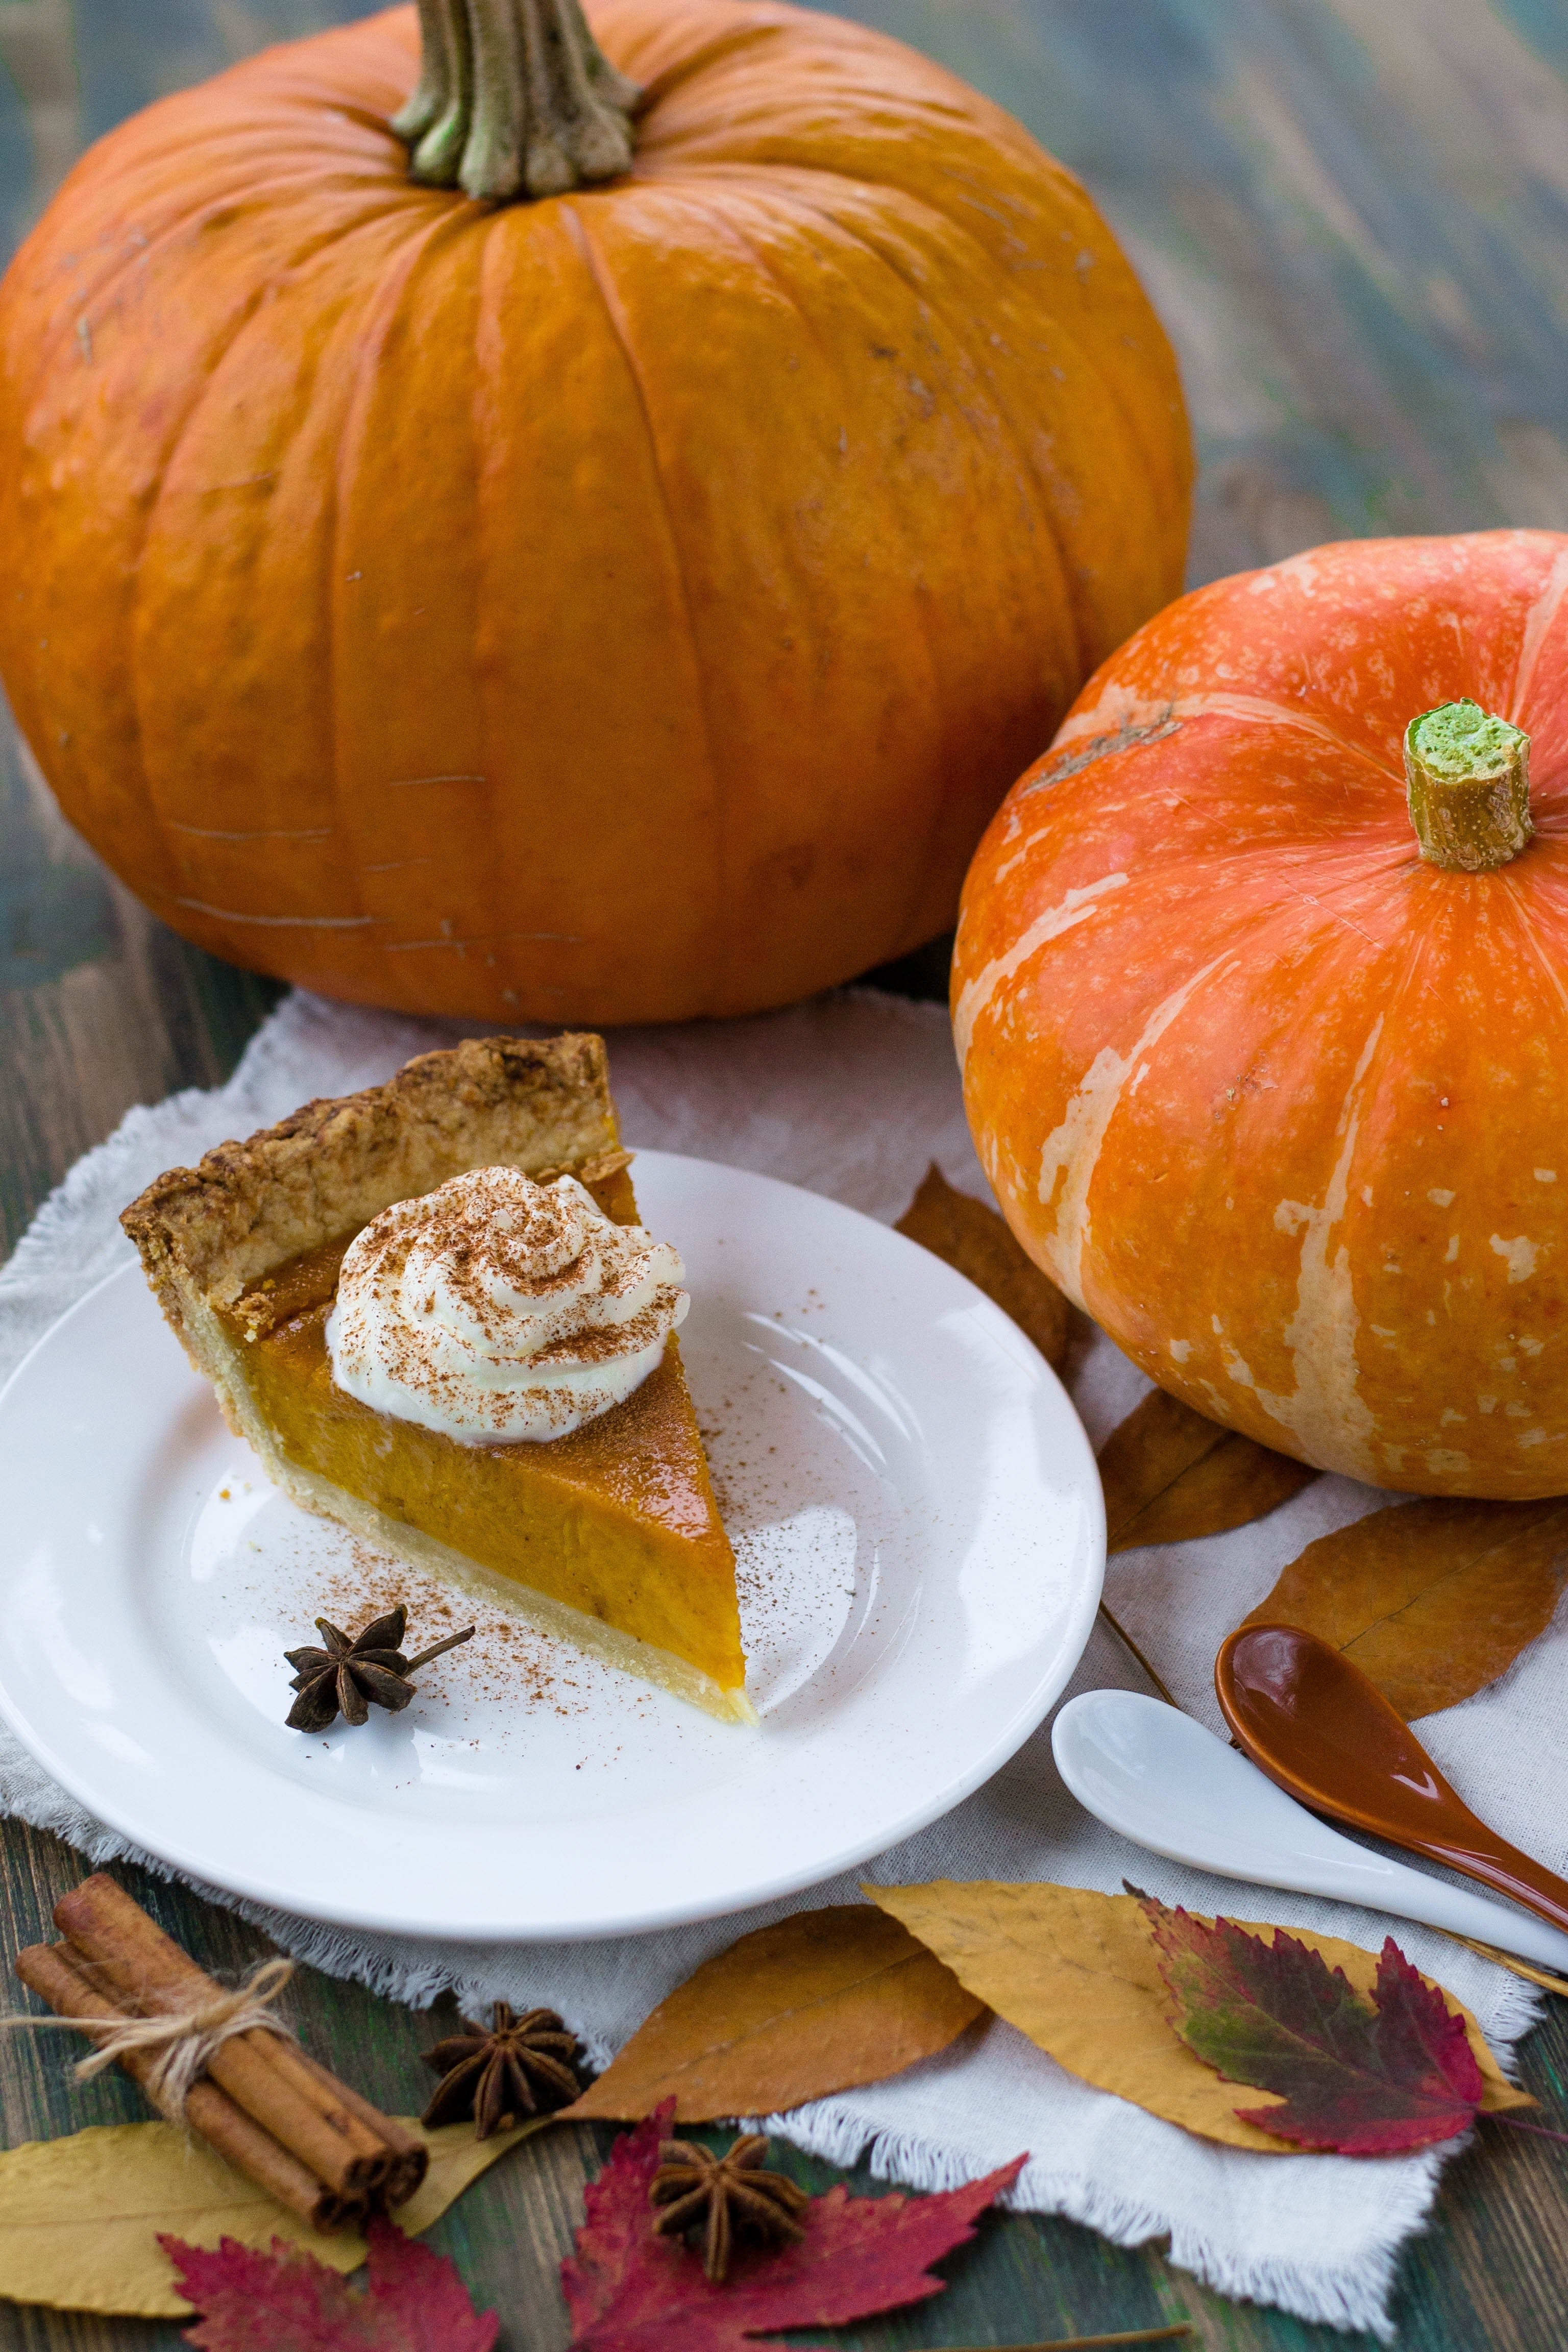 Italian pumpkin cheesecake